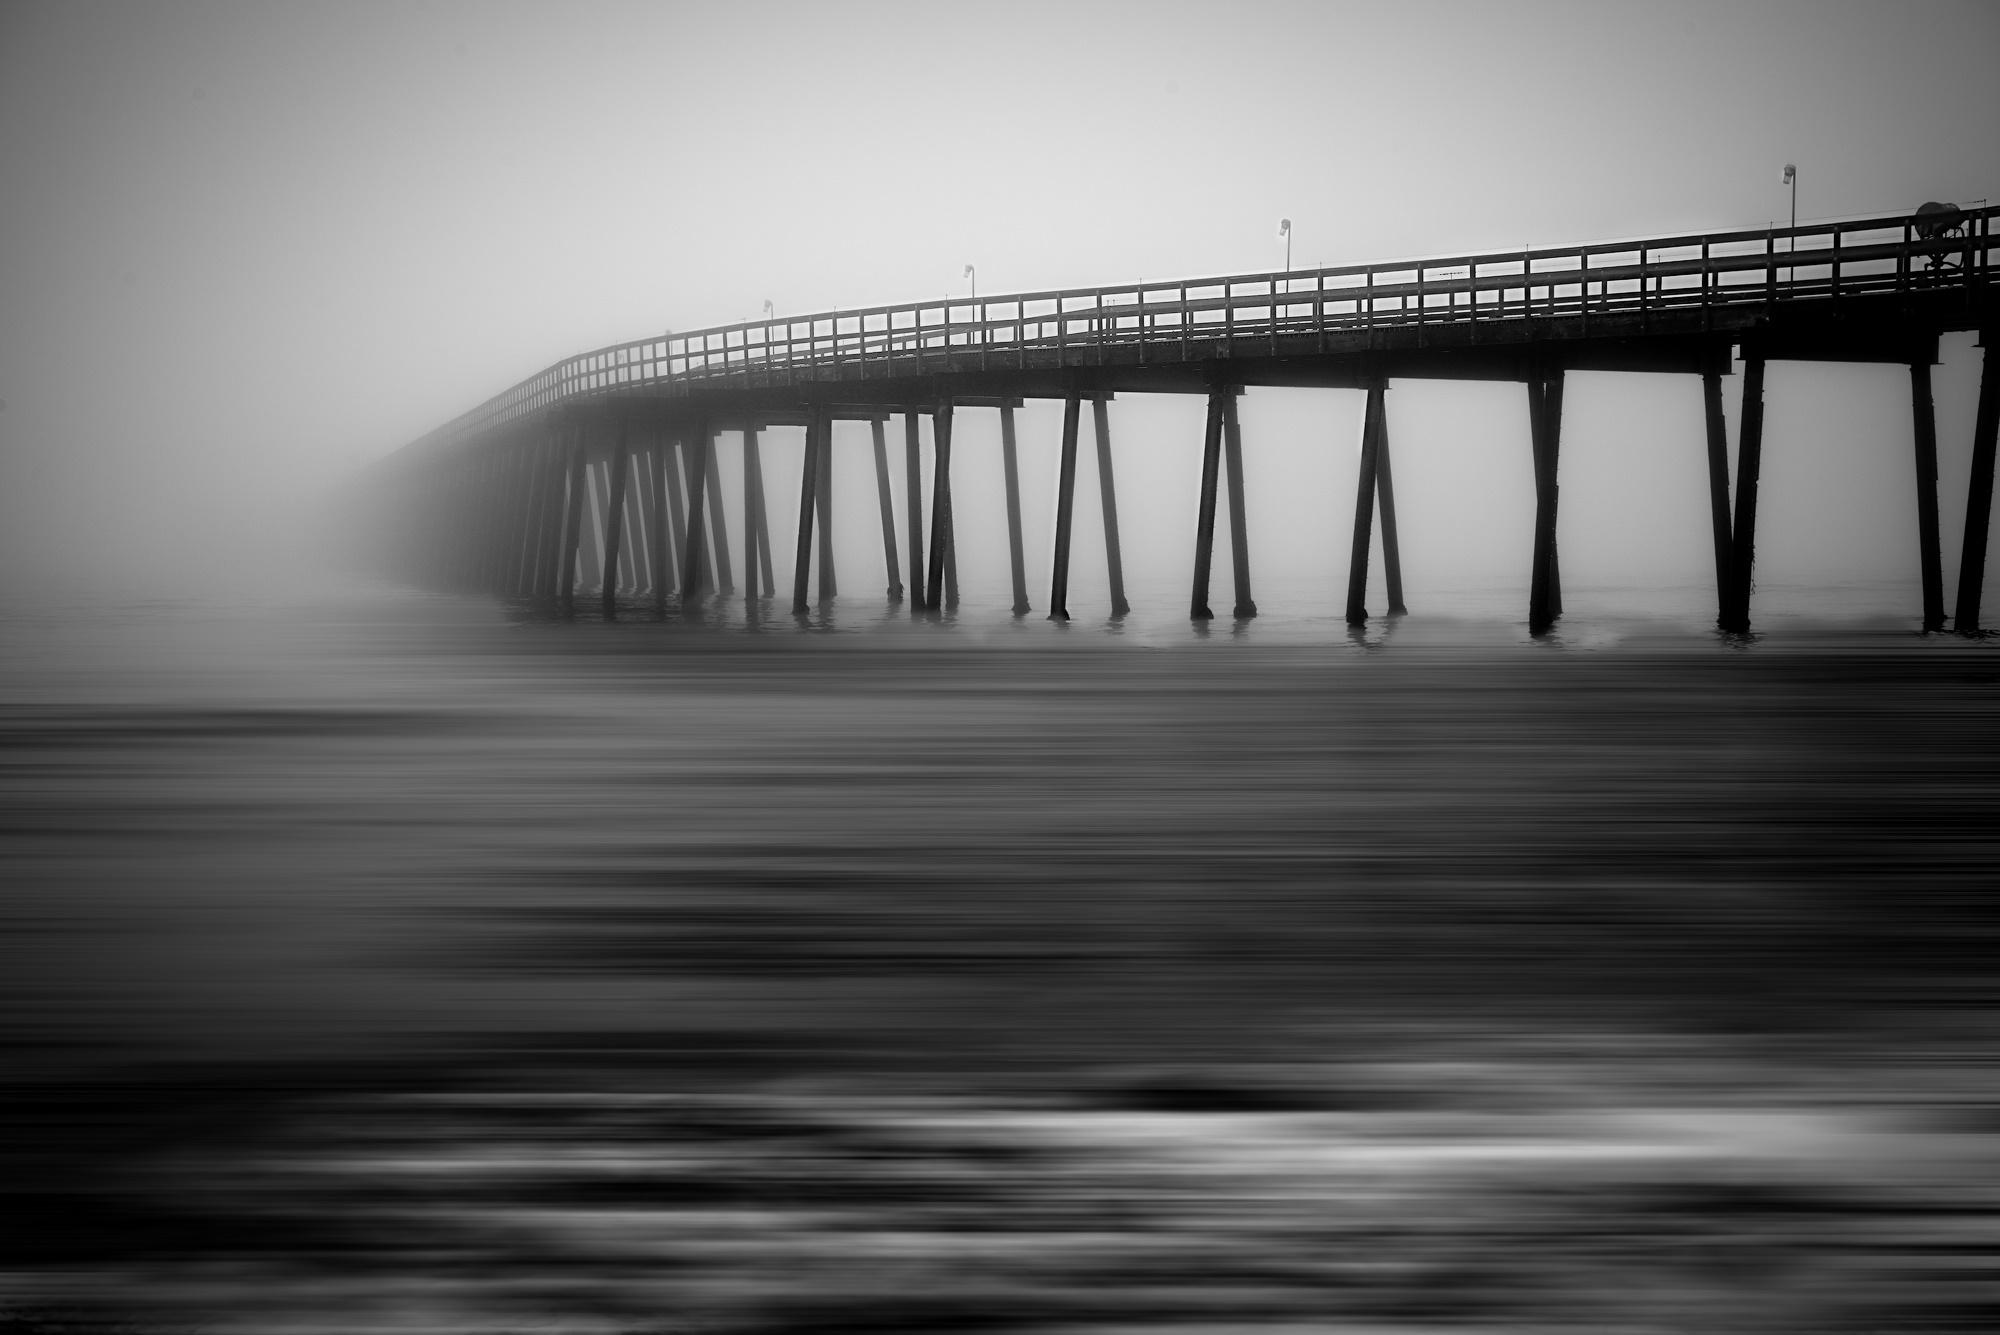 Early morning photo of the Goleta Pier taken by Greg Smith